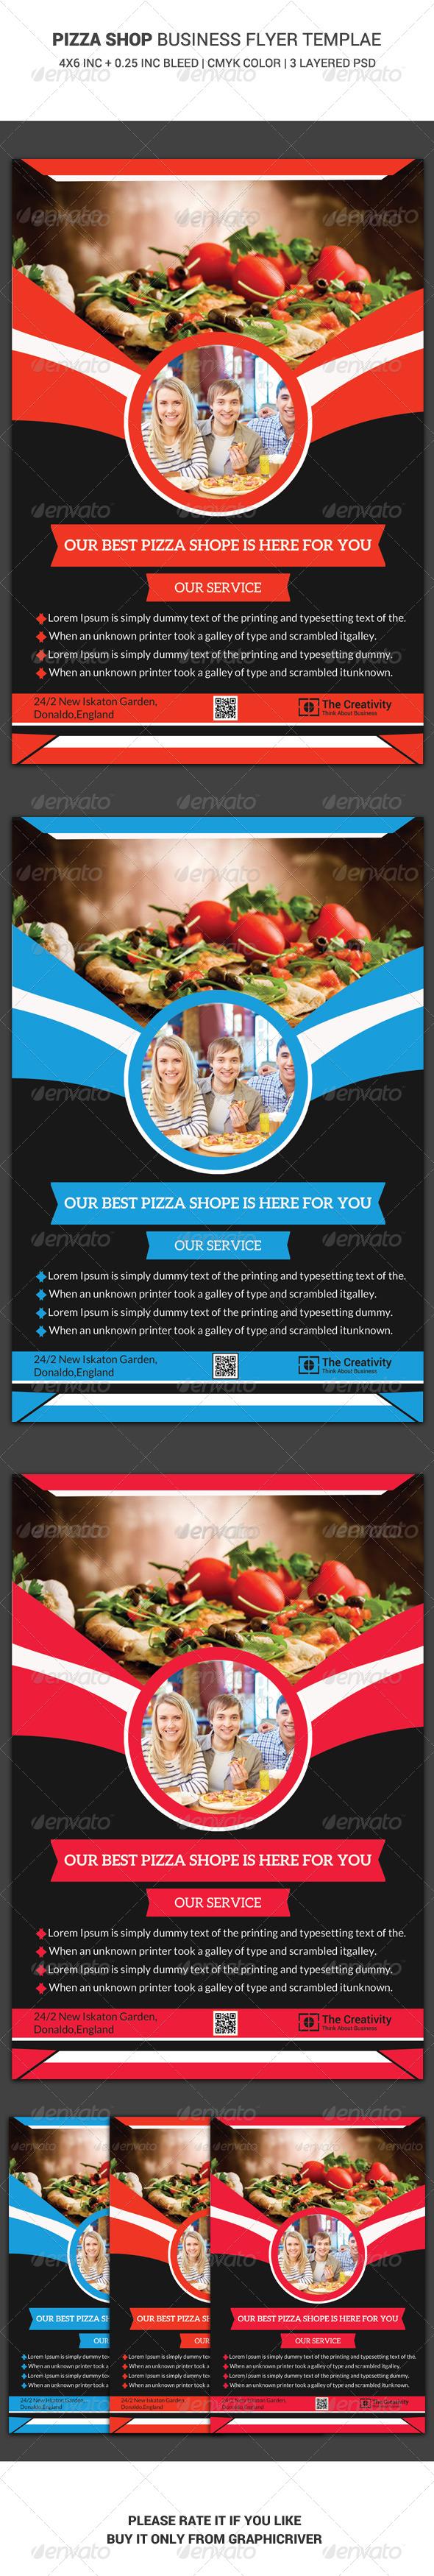 Pizza Shop Business Flyer Template